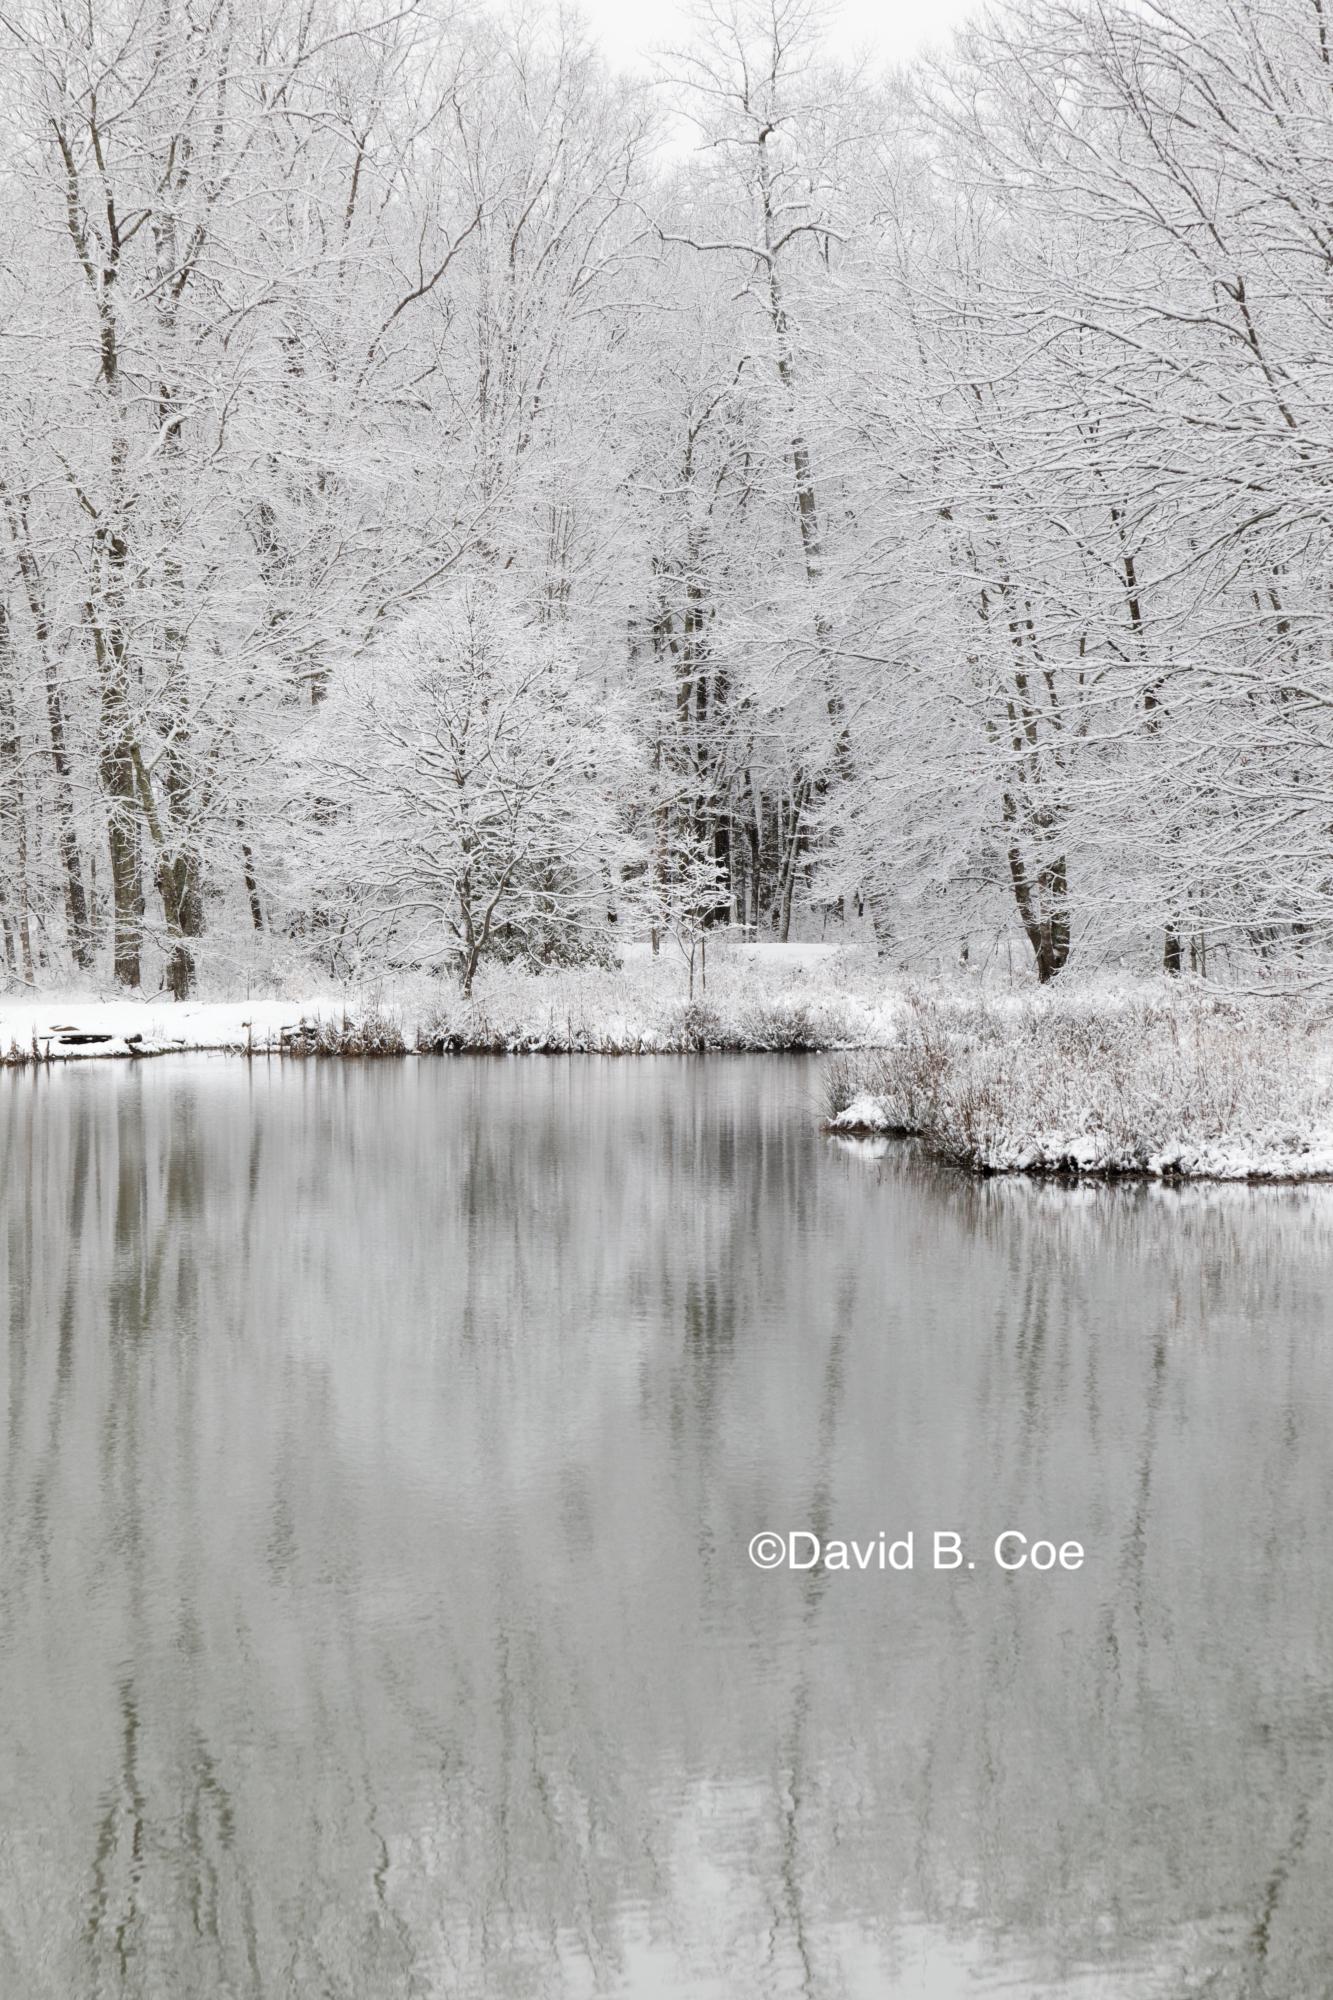 Pond in Snow I, by David B. Coe